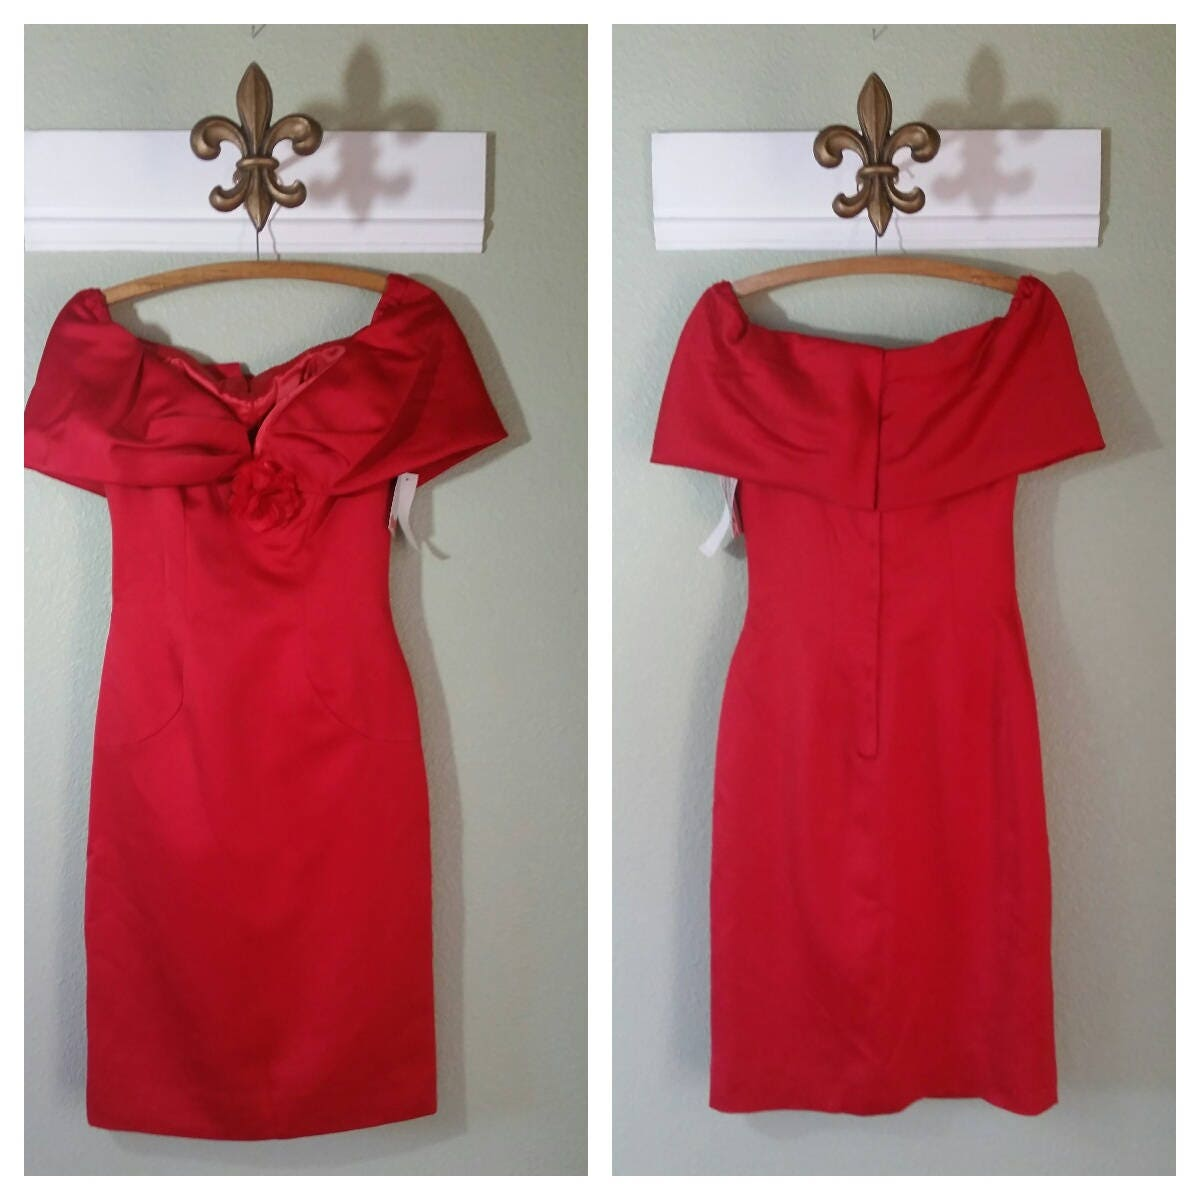 80s Dresses | Casual to Party Dresses Victor Costa Cocktail Dress, 1980s Cold Shoulder Red Size SM $12.00 AT vintagedancer.com